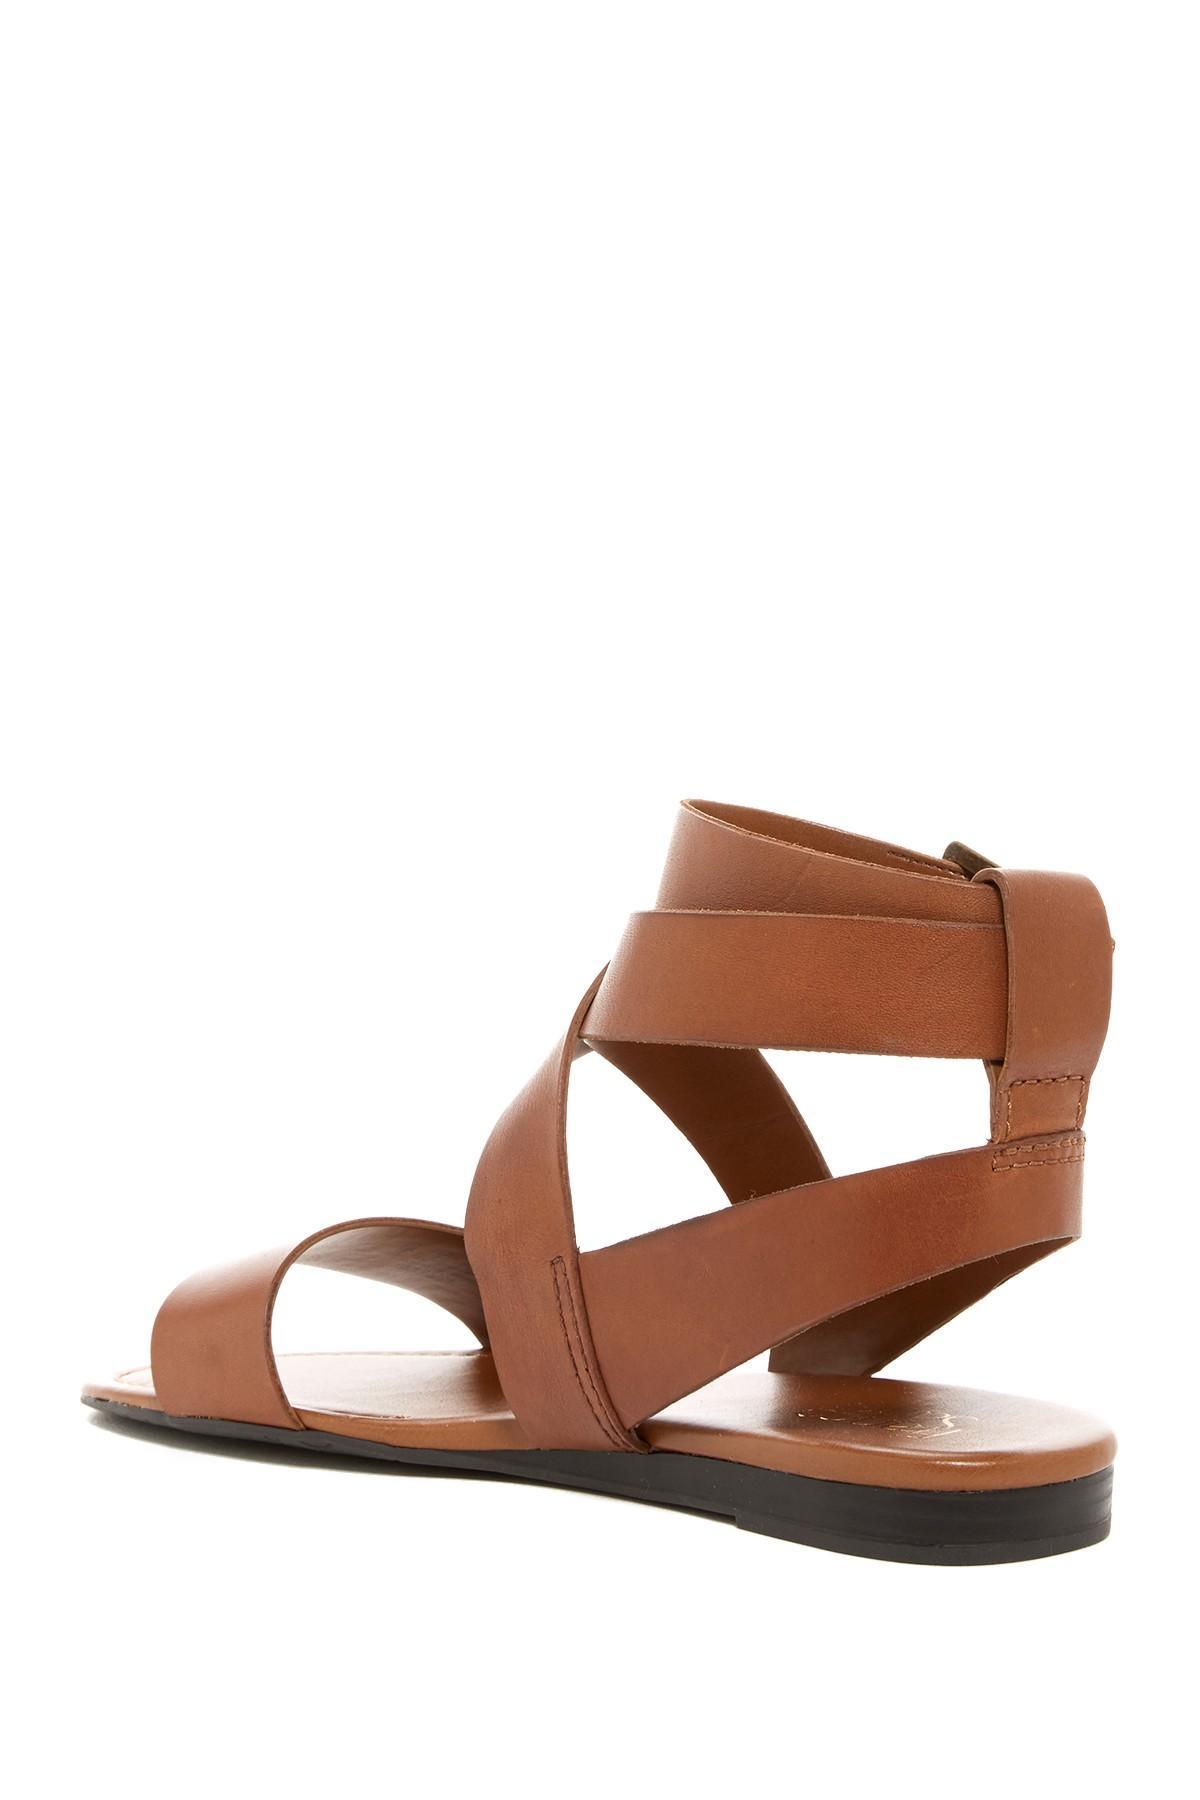 Lyst Franco Sarto Giovanna Strappy Sandal In Brown